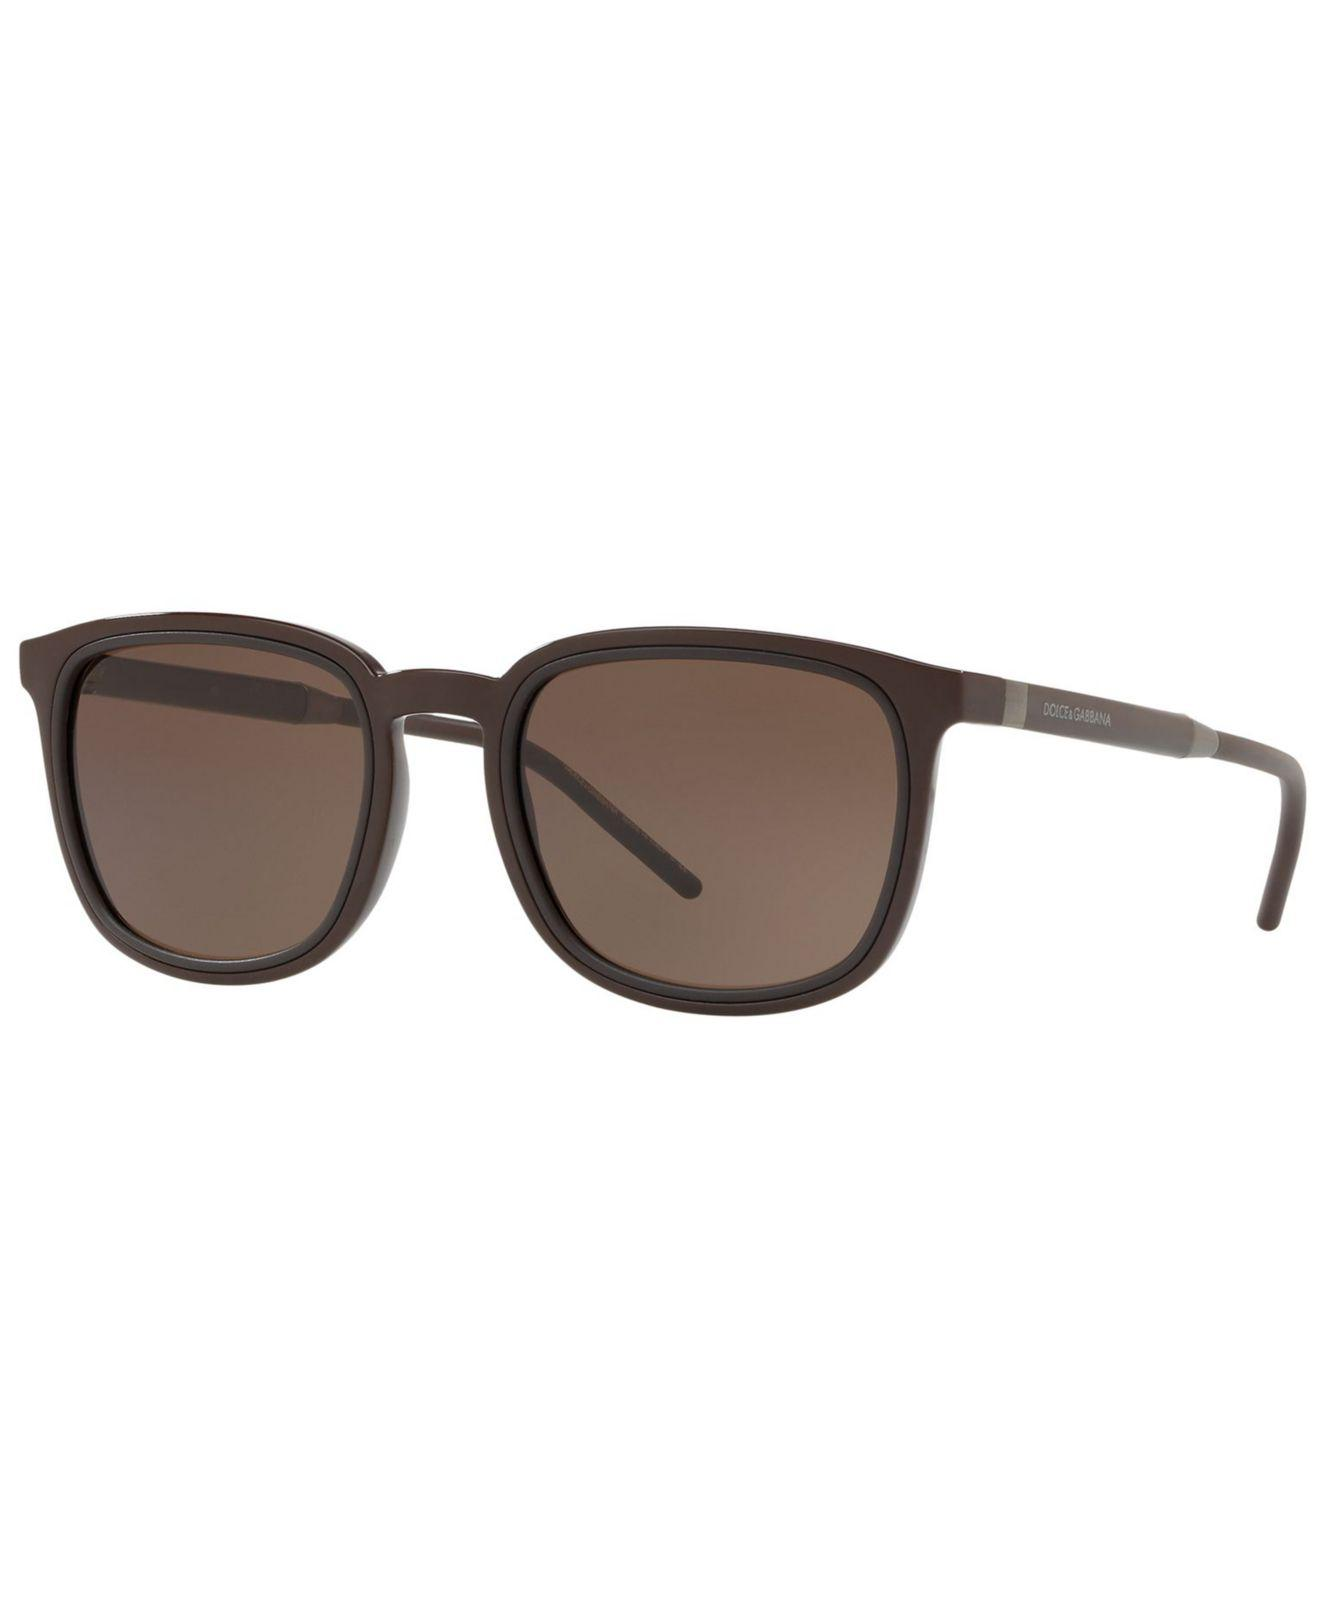 513301ea34c Dolce   Gabbana. Women s Brown Sunglasses ...